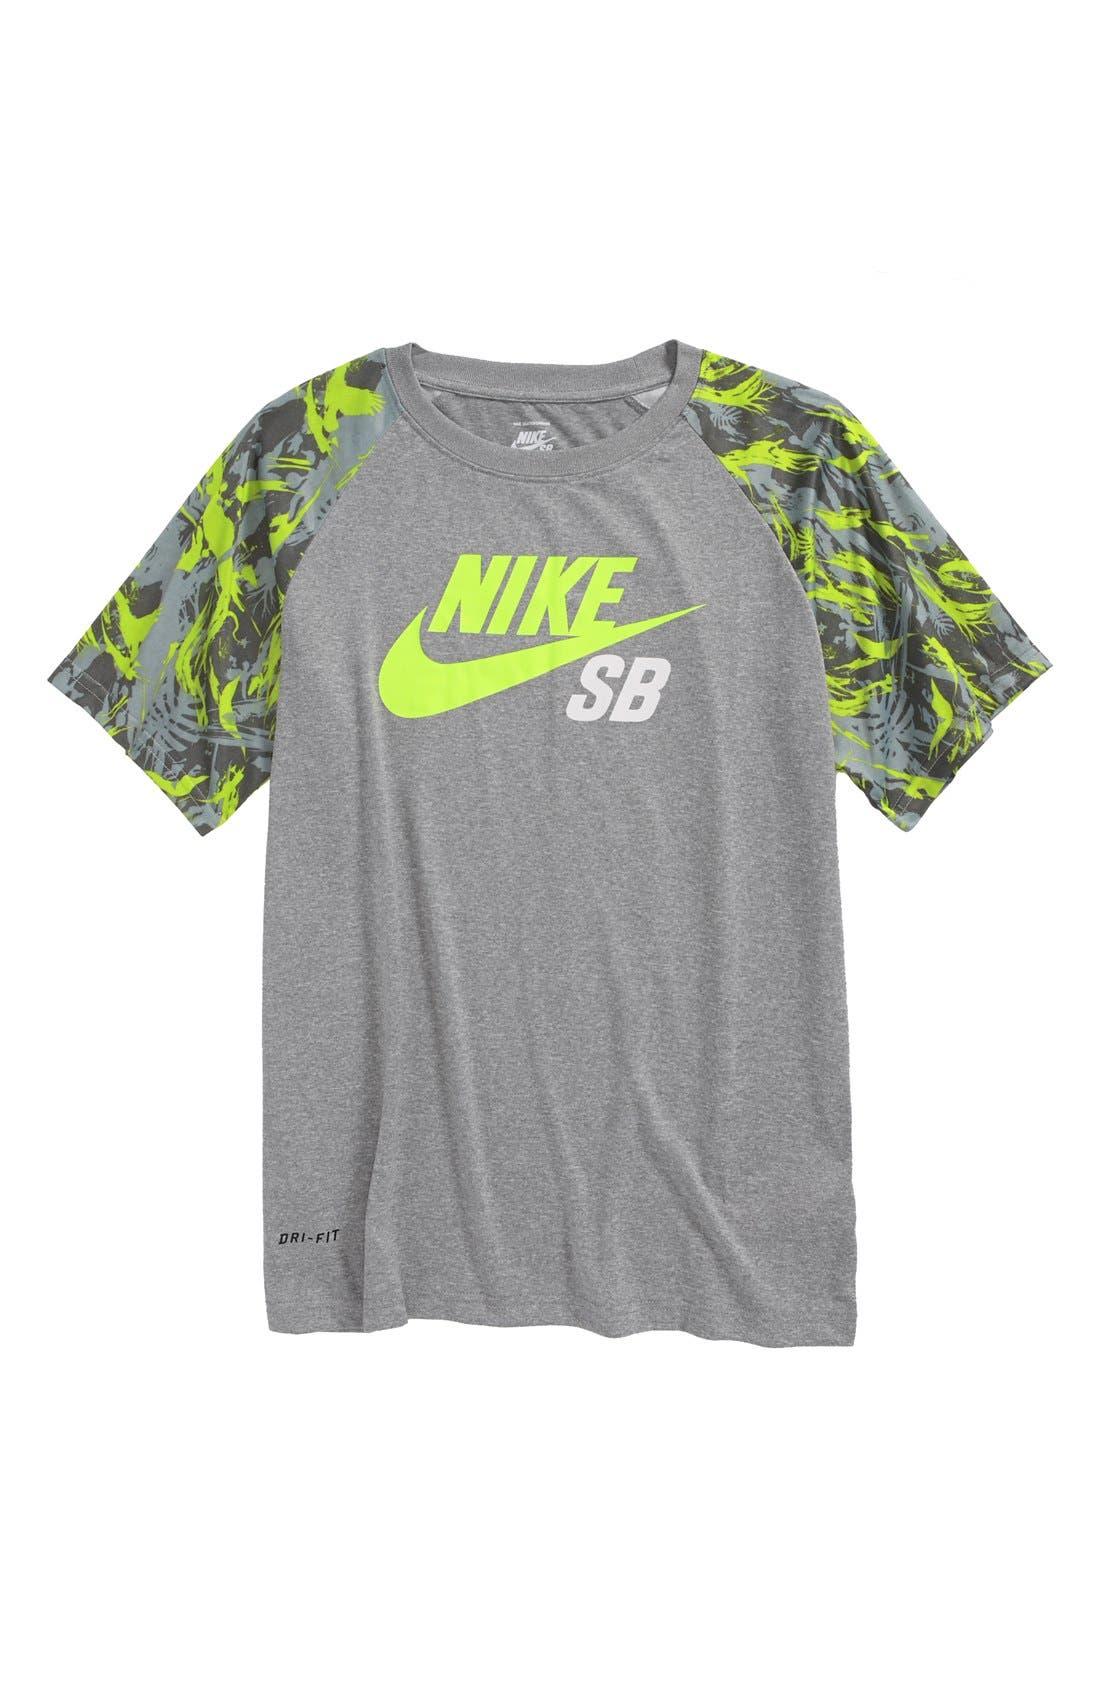 Alternate Image 1 Selected - Nike 'Lizard Camo' Dri-FIT T-Shirt (Big Boys)